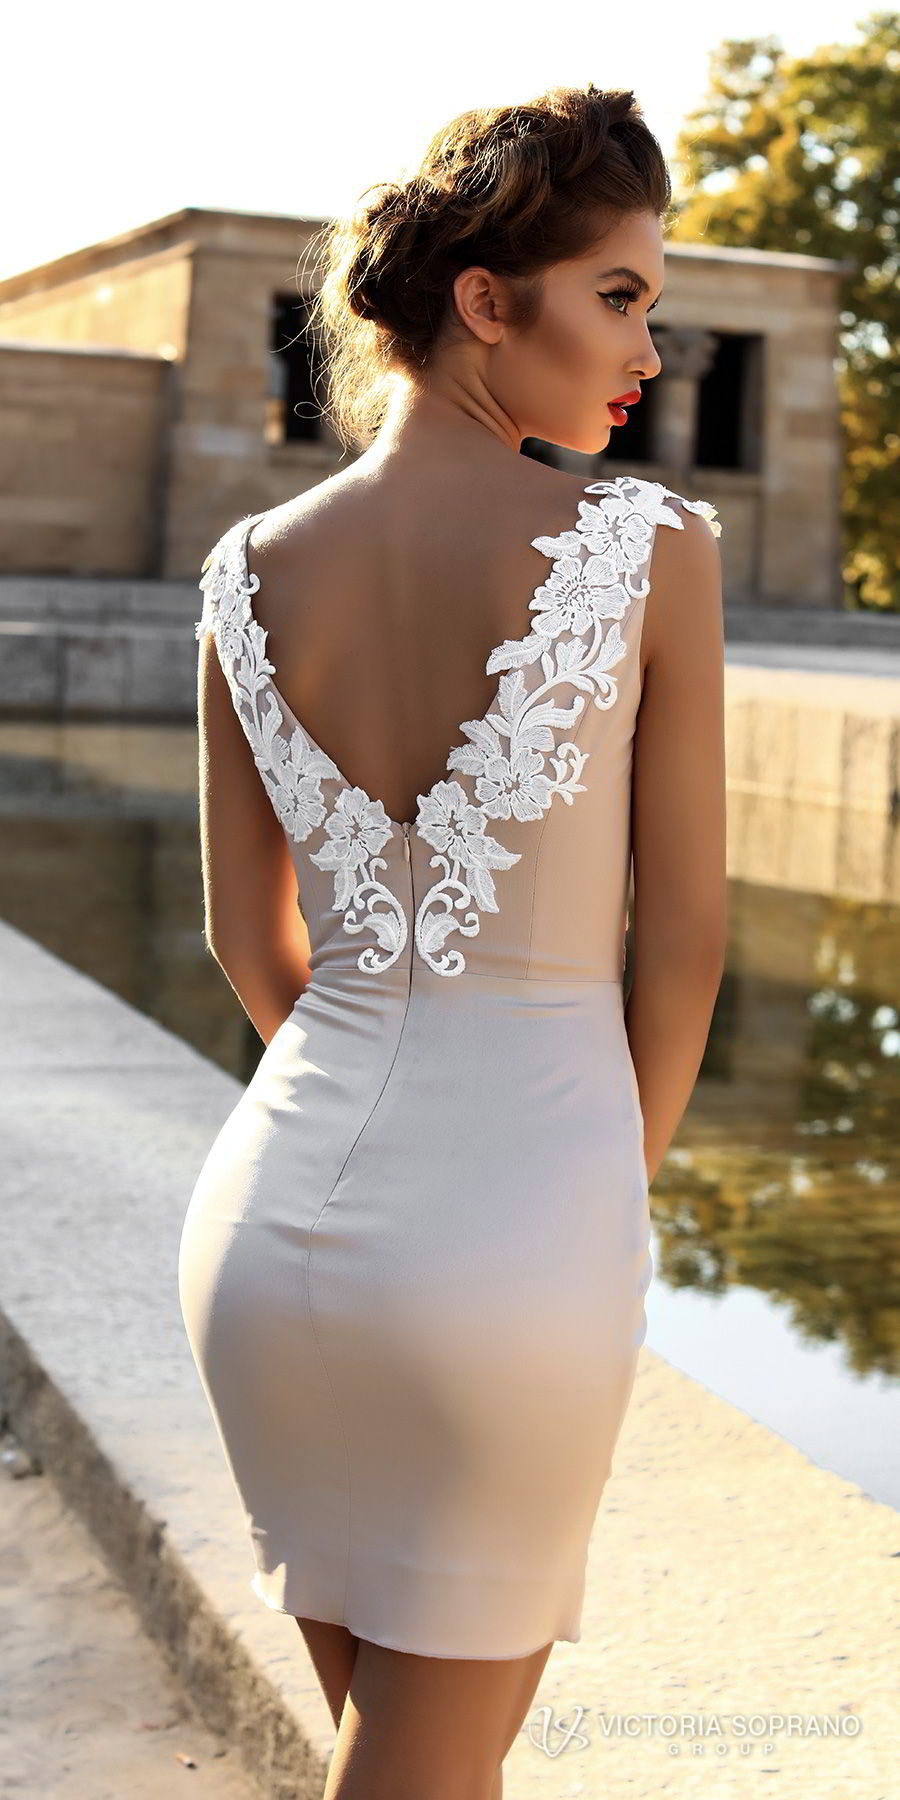 victoria soprano 2018 bridal cap sleeves deep v neck heavily embellished bodice sexy modern mini skirt short wedding dress open v back (leila) zbv